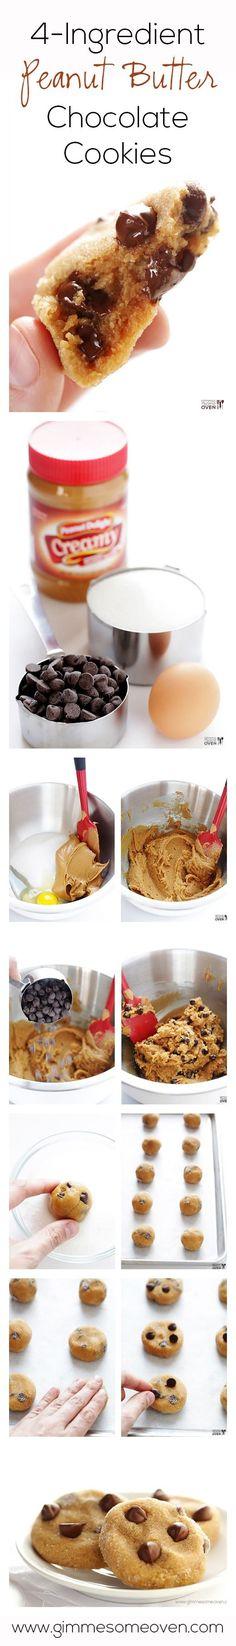 4 Ingredient Peanut Butter Chocolate Cookies